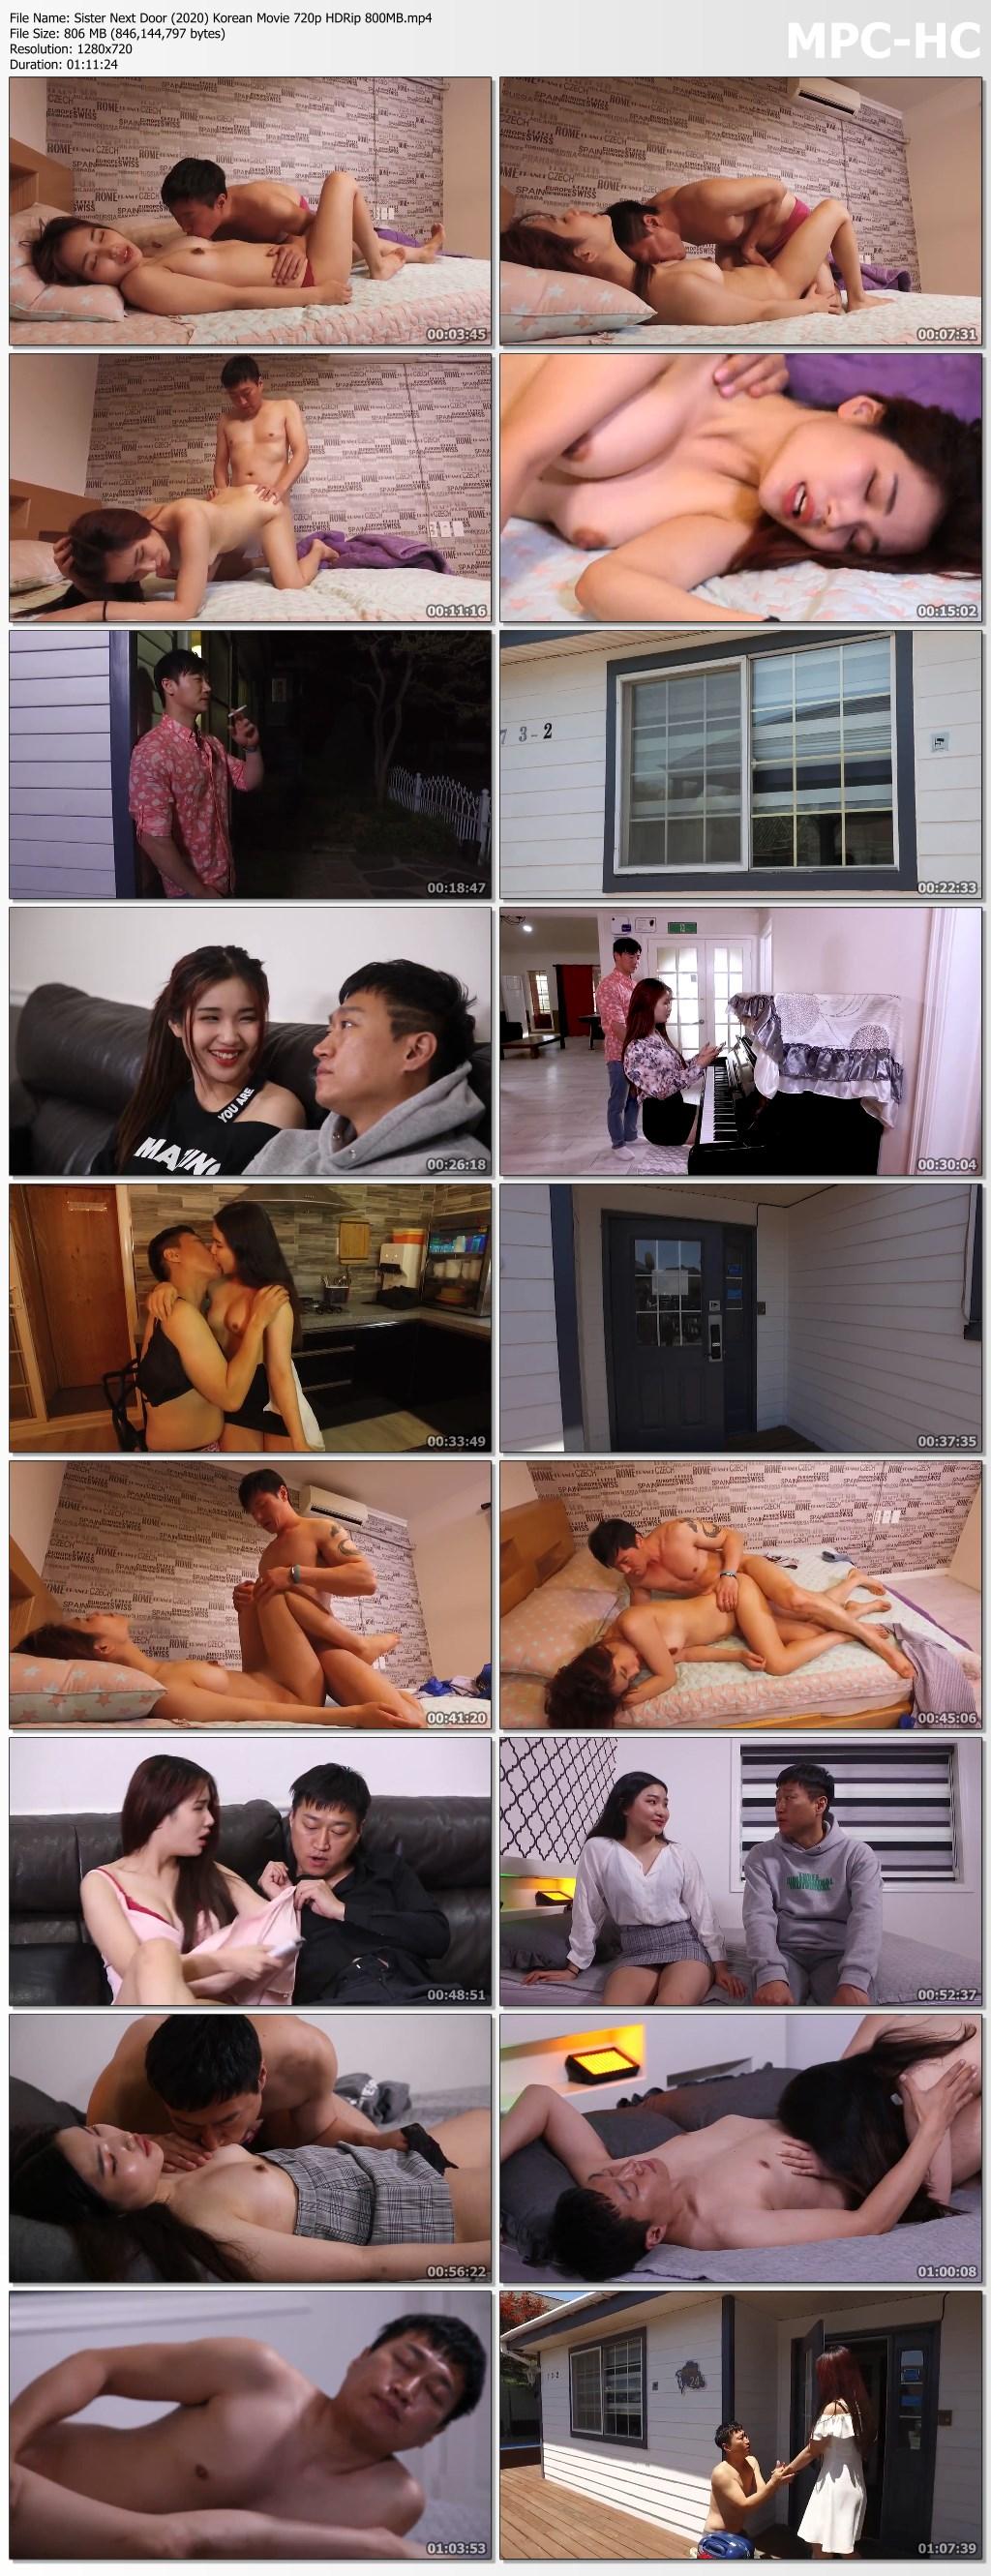 Sister Next Door (2020) Korean Movie 720p HDRip 800MB.mp4 thumbs